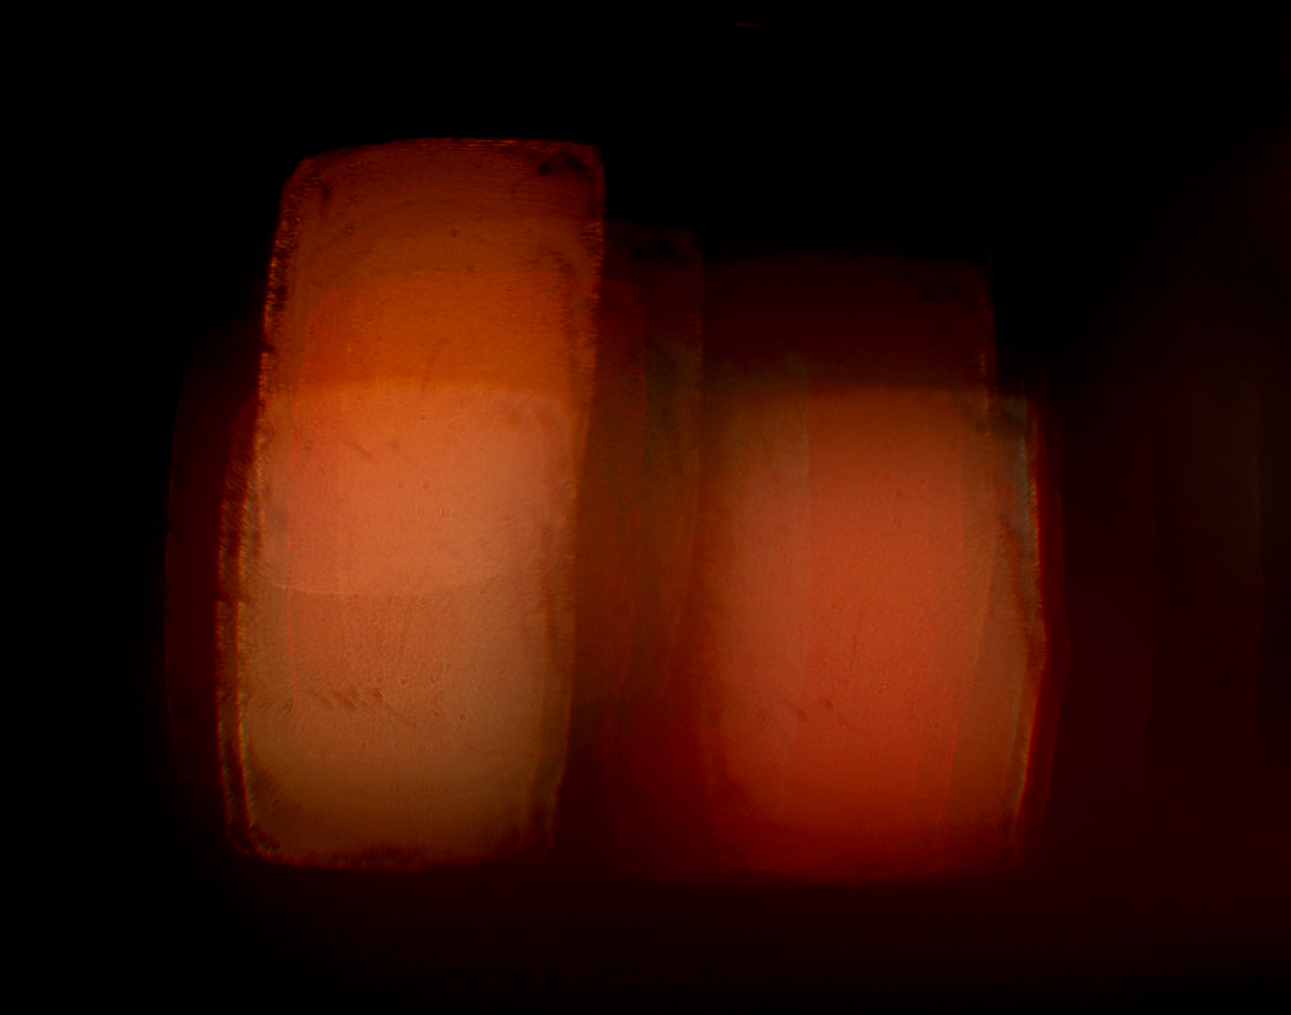 Rothko-esque